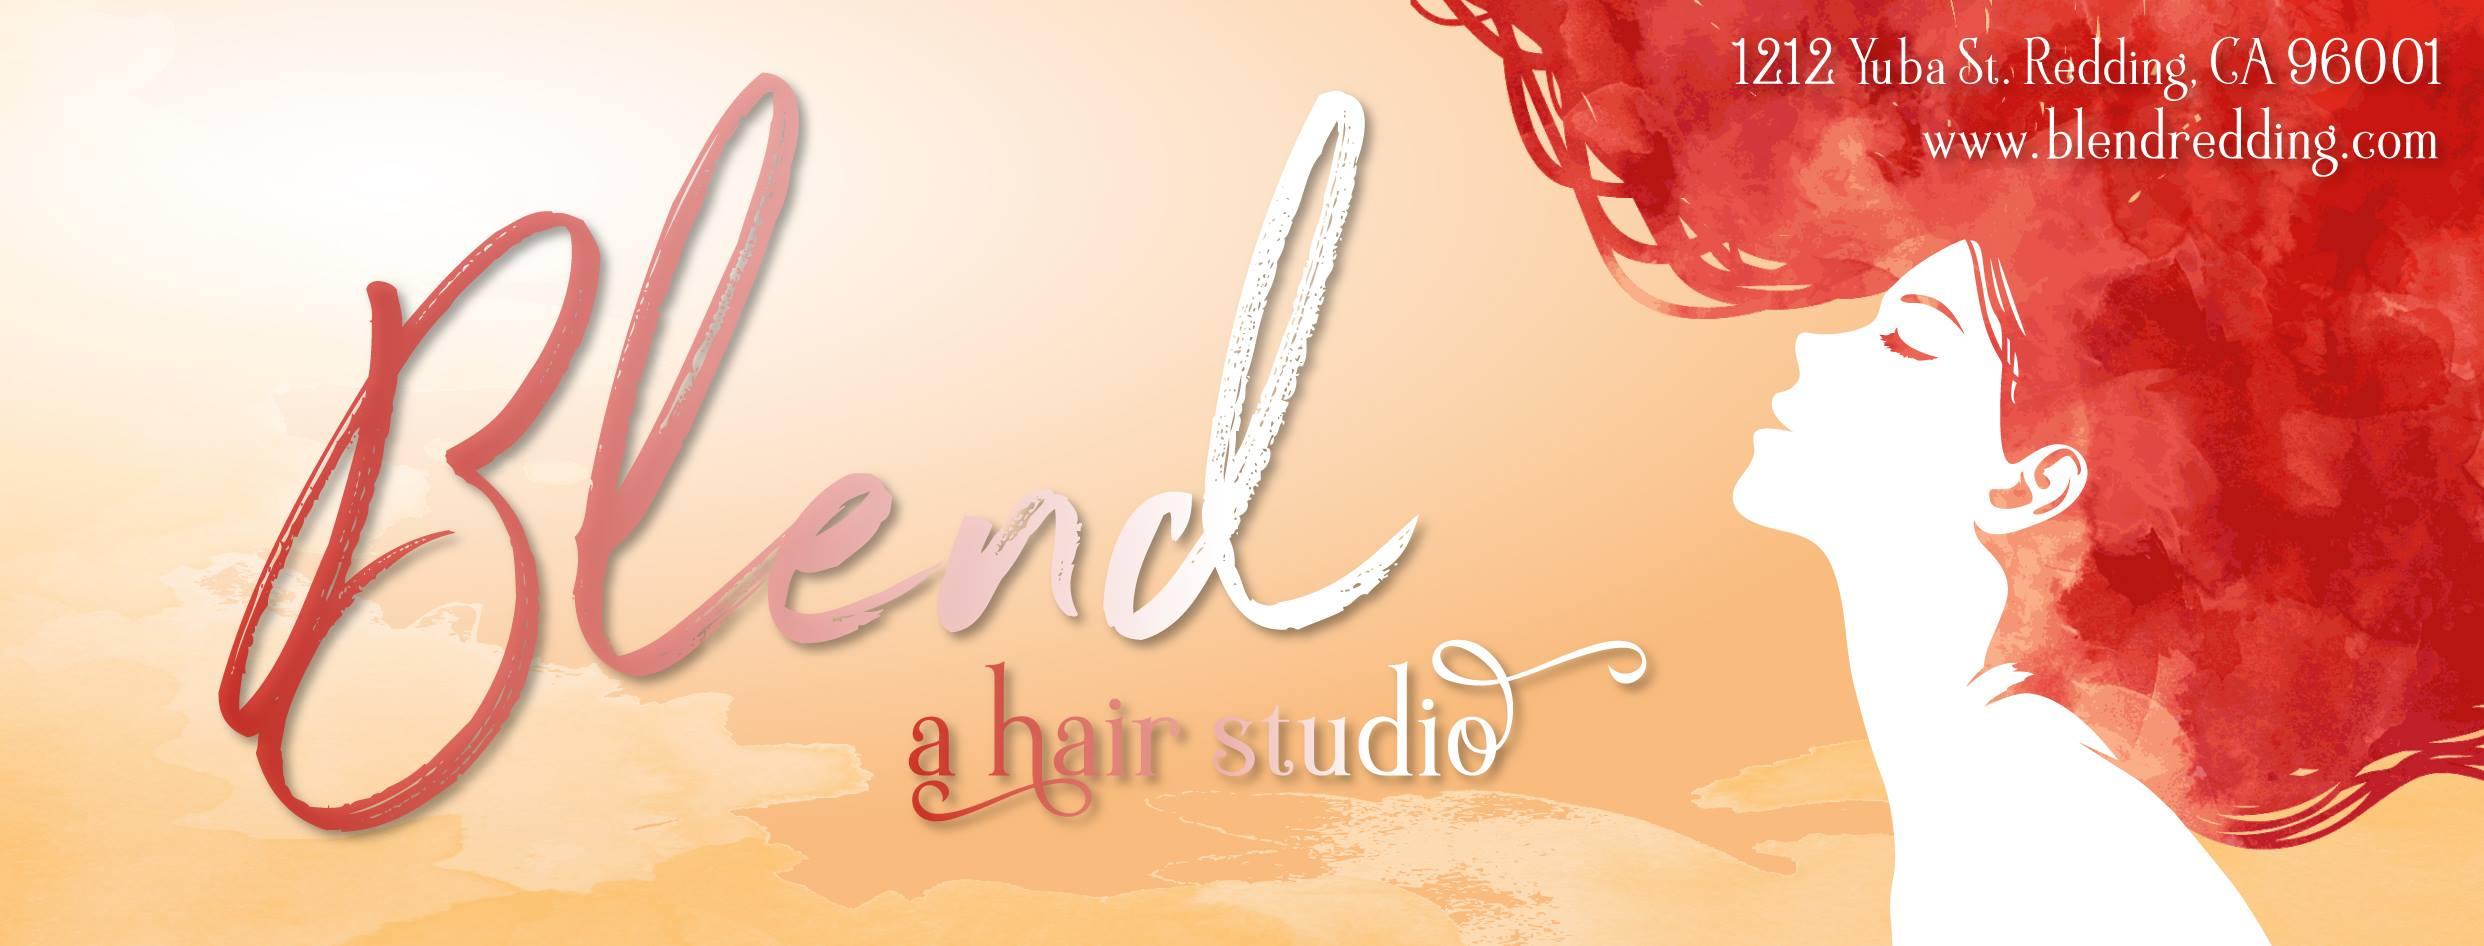 Blend. A Hair Studio | Redding Health Expo, Redding CA Health and Wellness Show